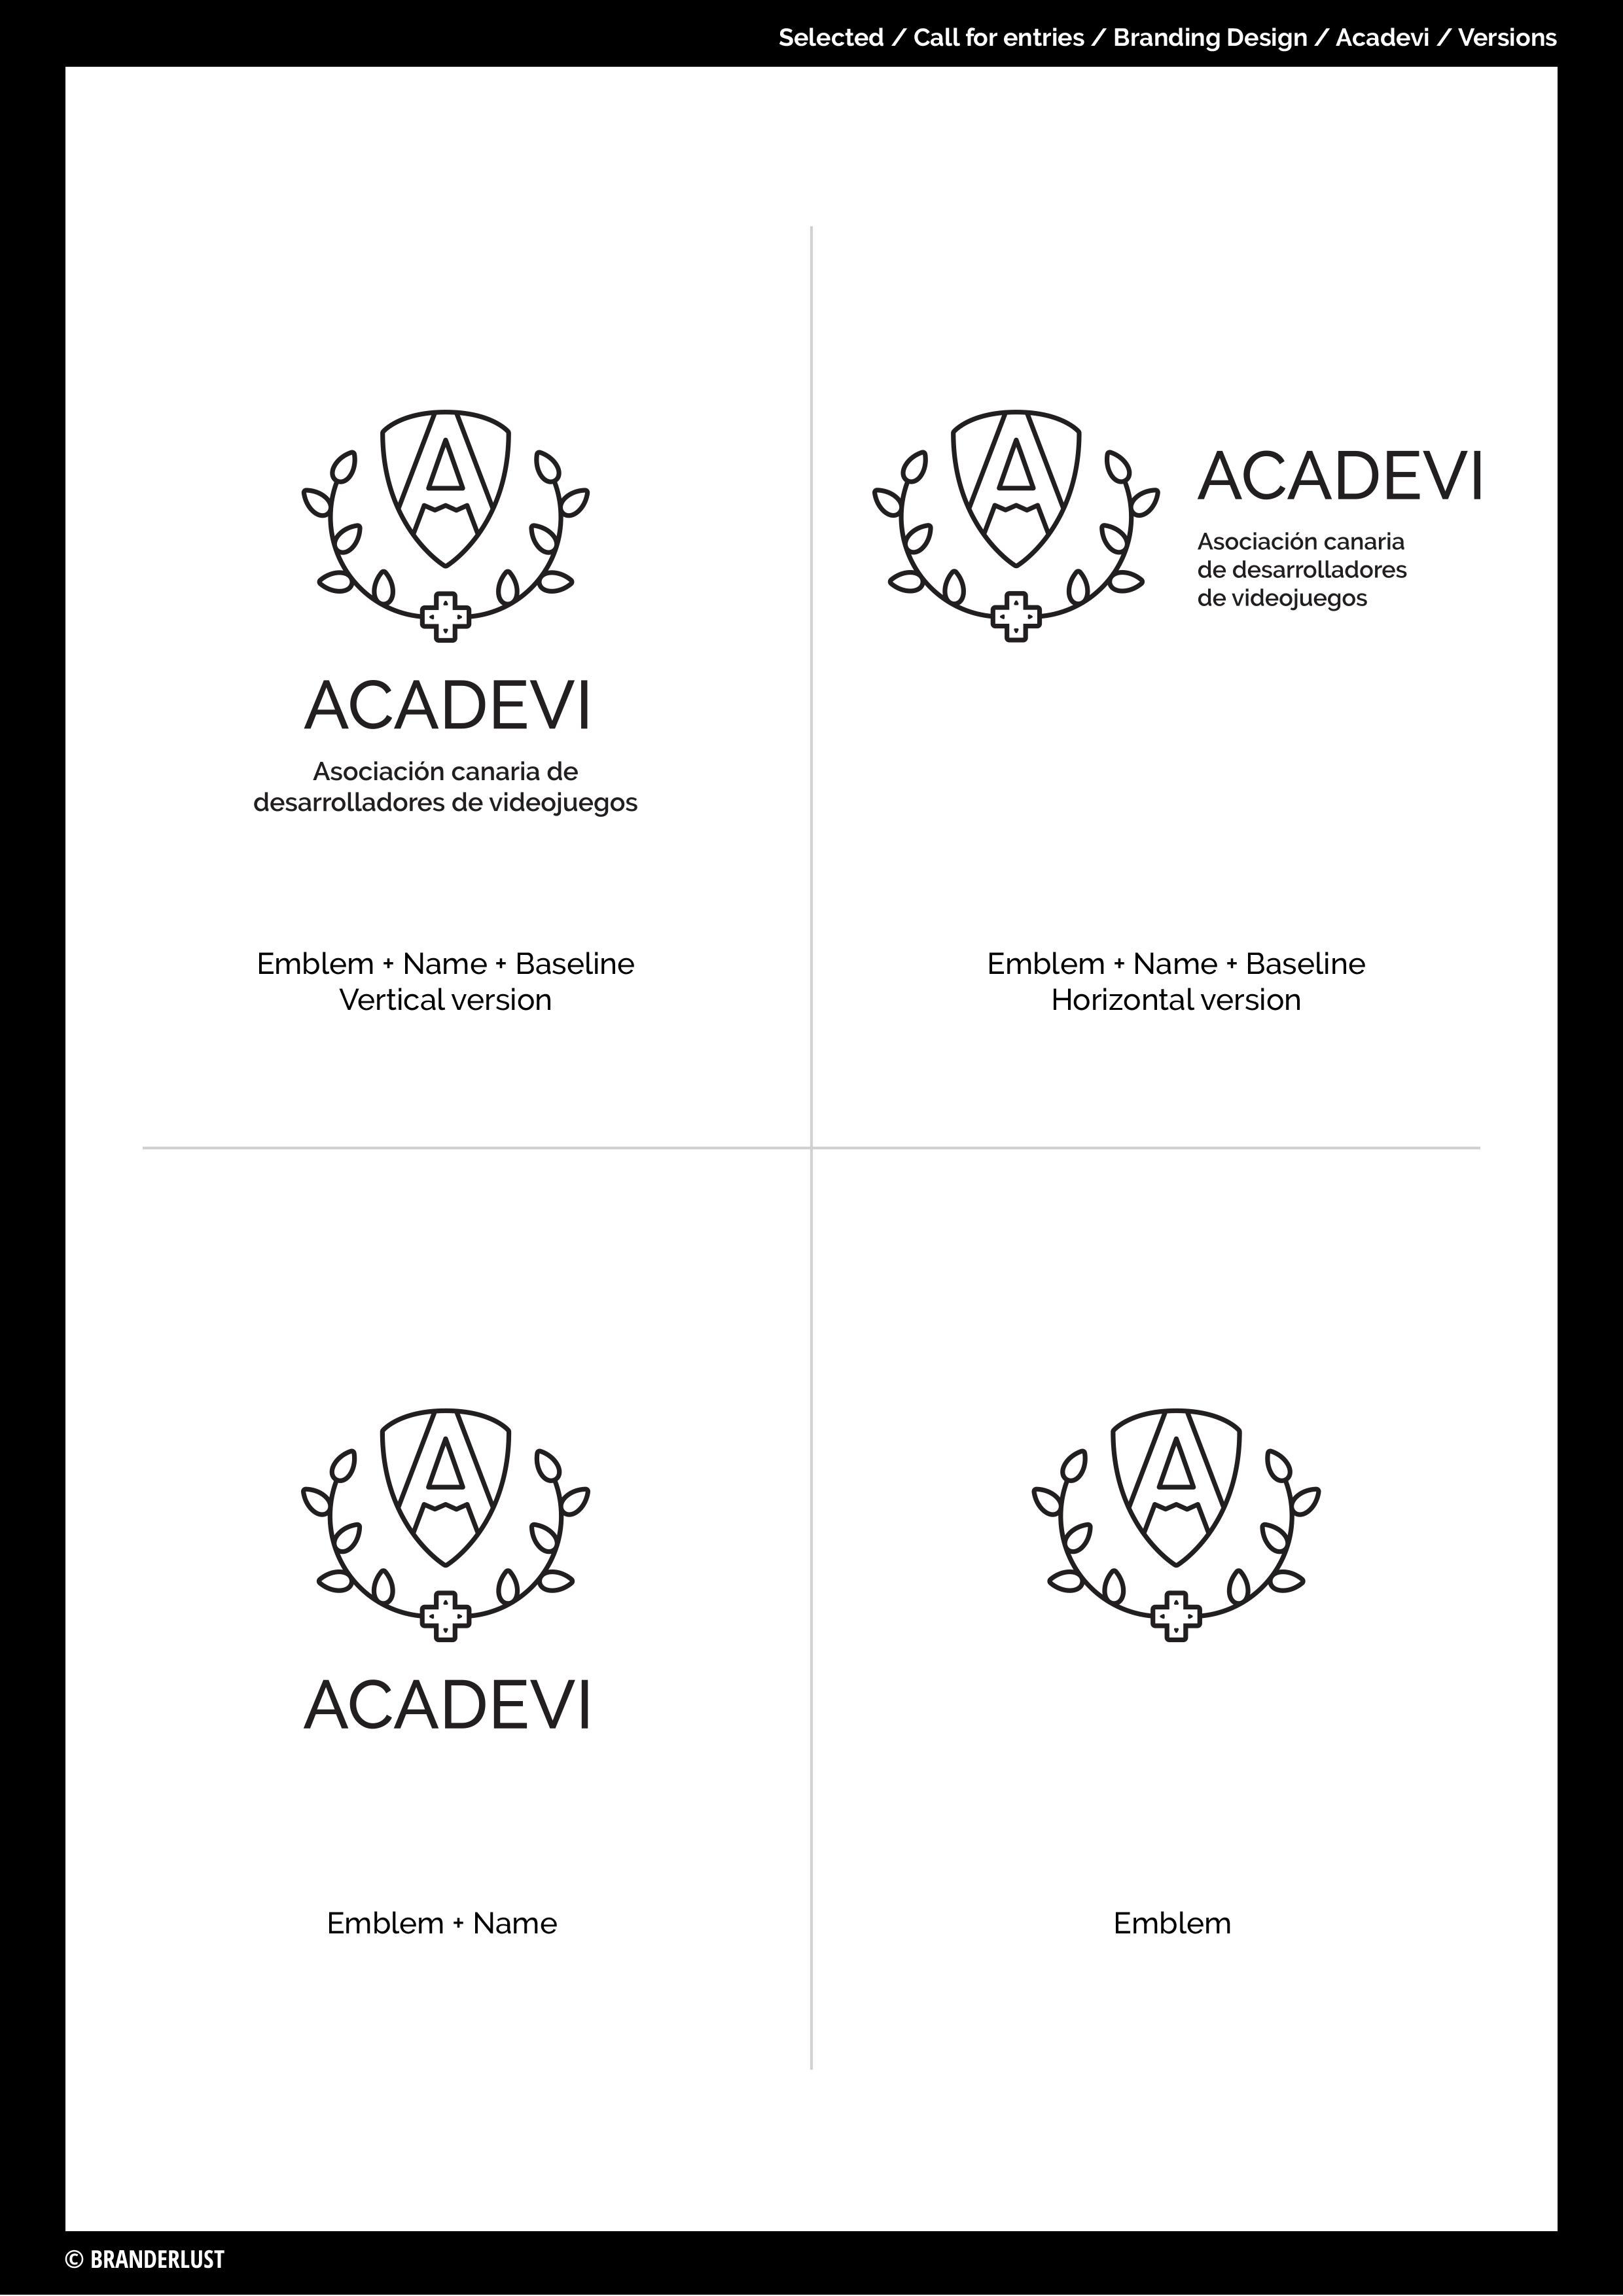 ACADEVI by Branderlust - Creative Work - $i